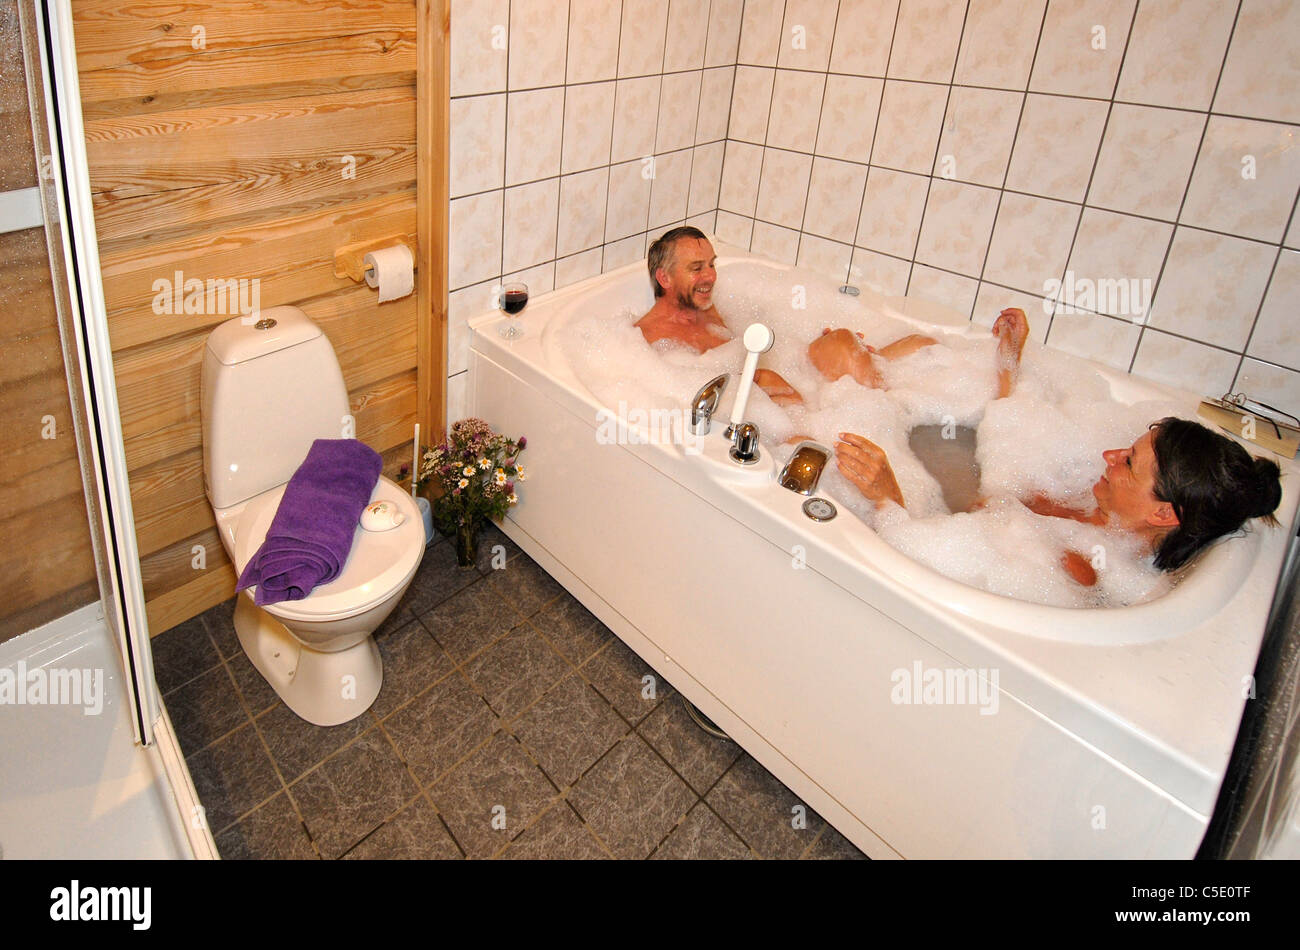 Wooden Bath Tub Stock Photos & Wooden Bath Tub Stock Images - Alamy